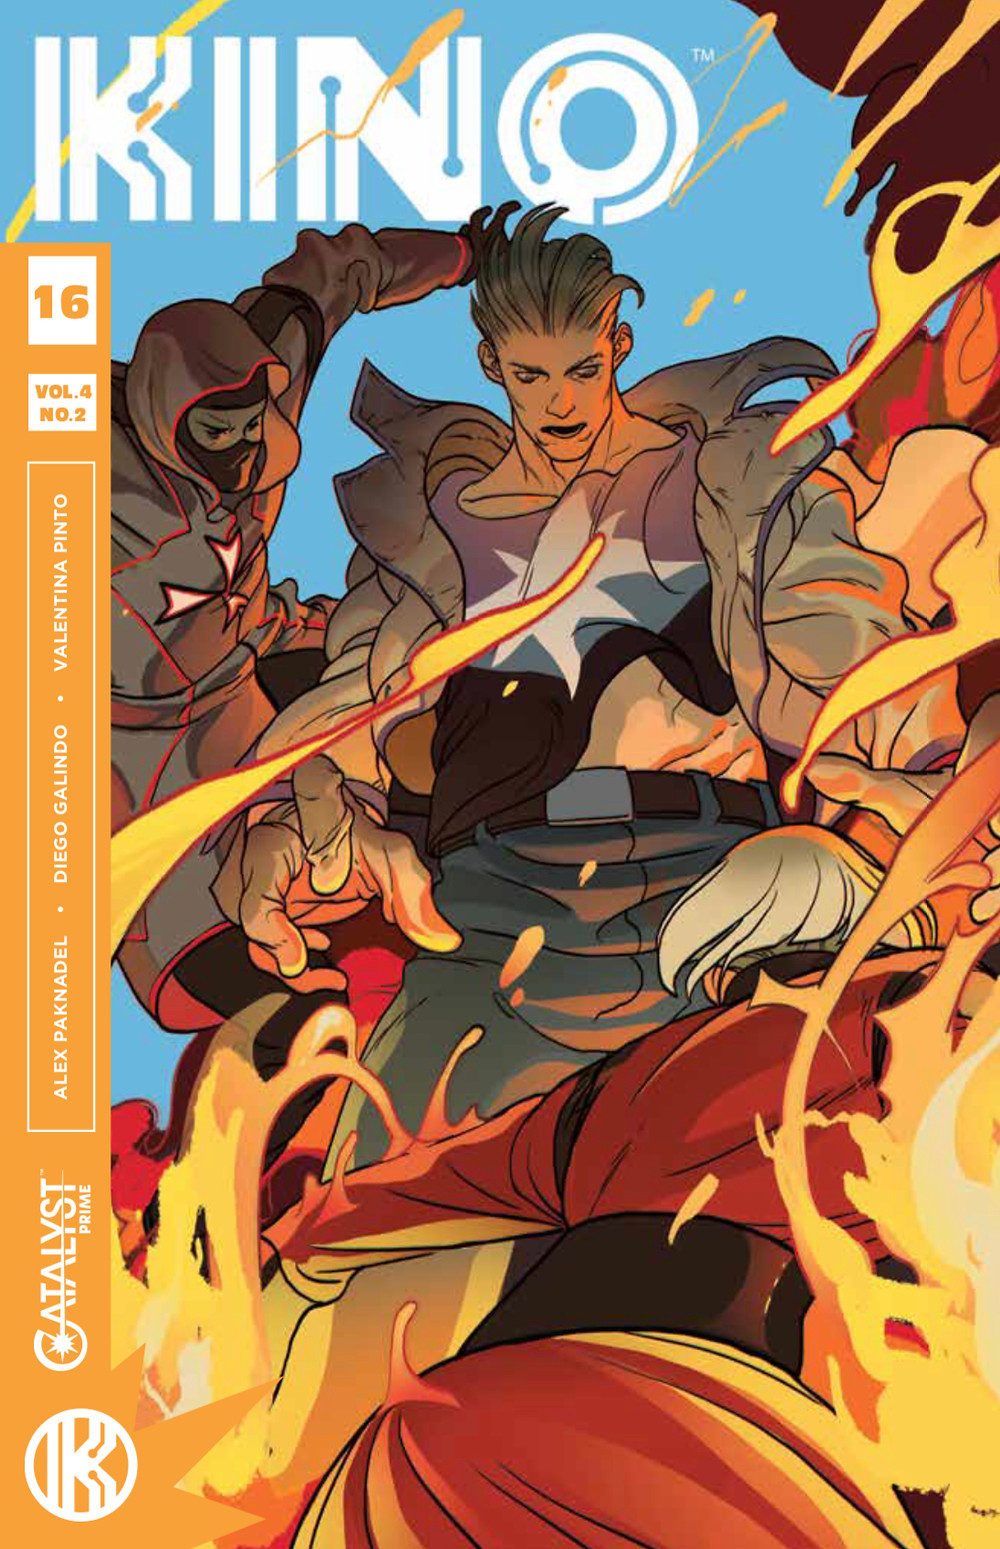 KINO, Issue #16, cover by Baldemar Rivas, Lion Forge, Paknadel/Galindo